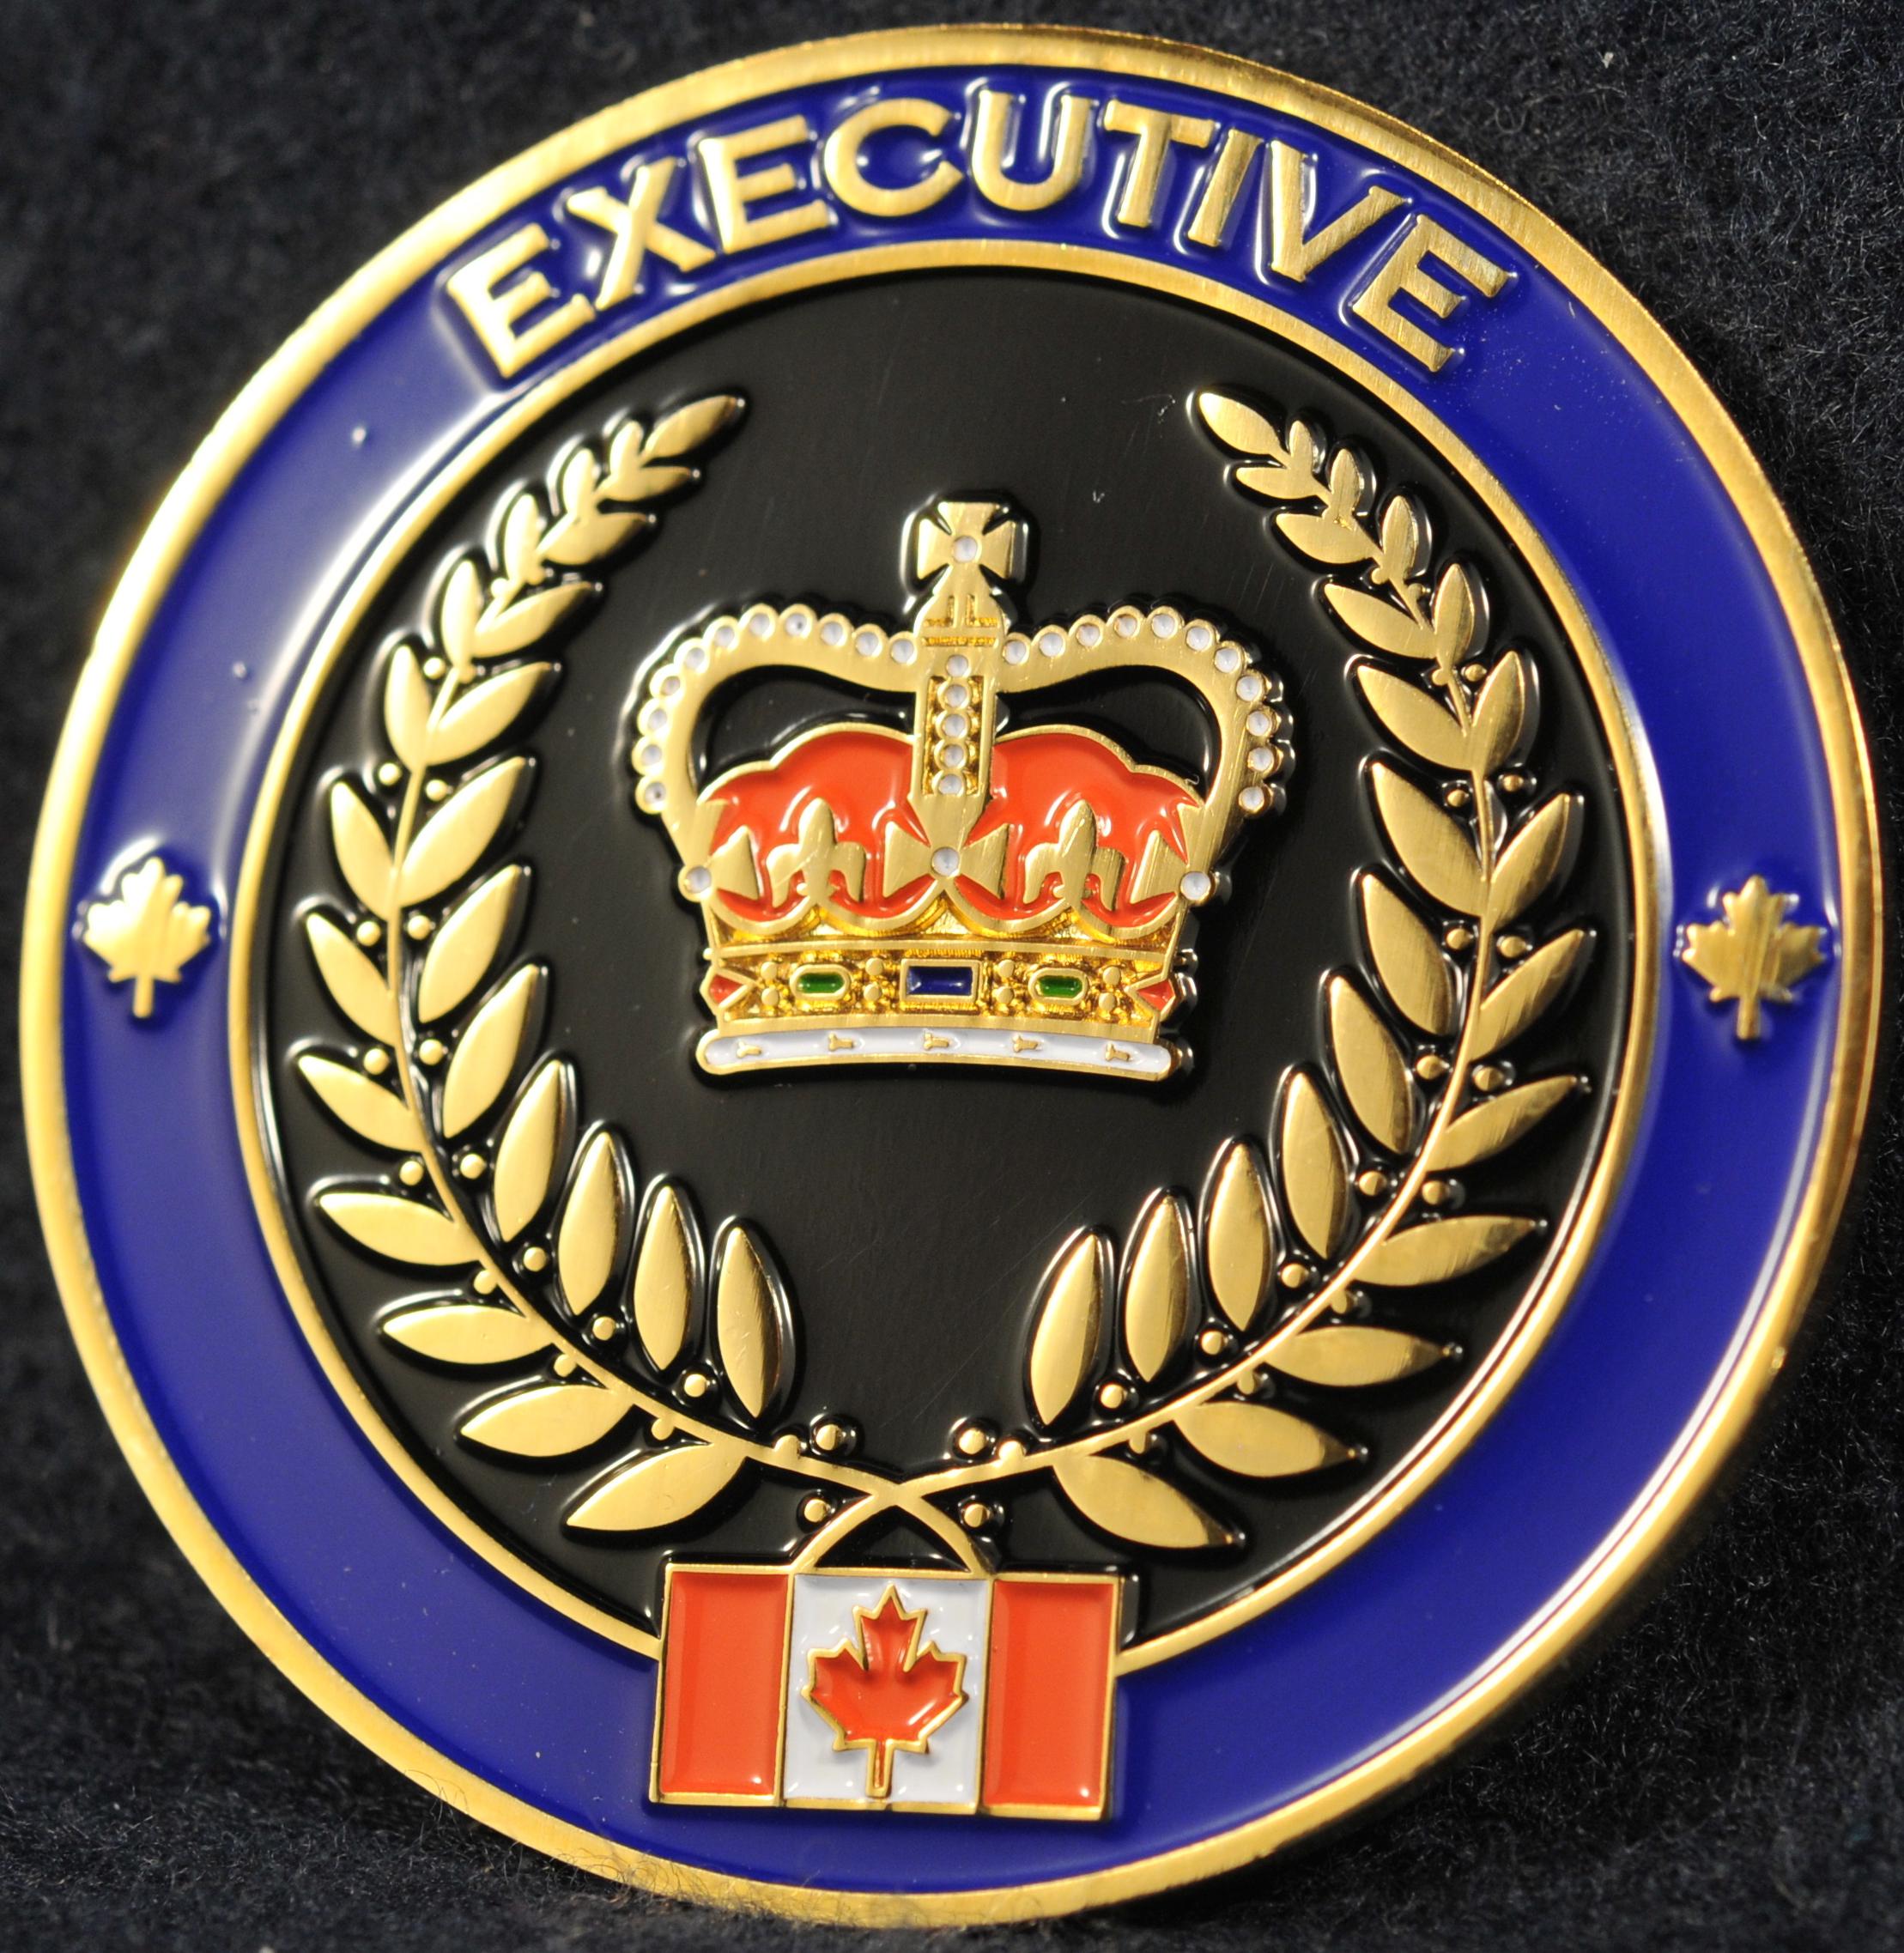 Winnipeg Police Service Executive Challengecoins Ca